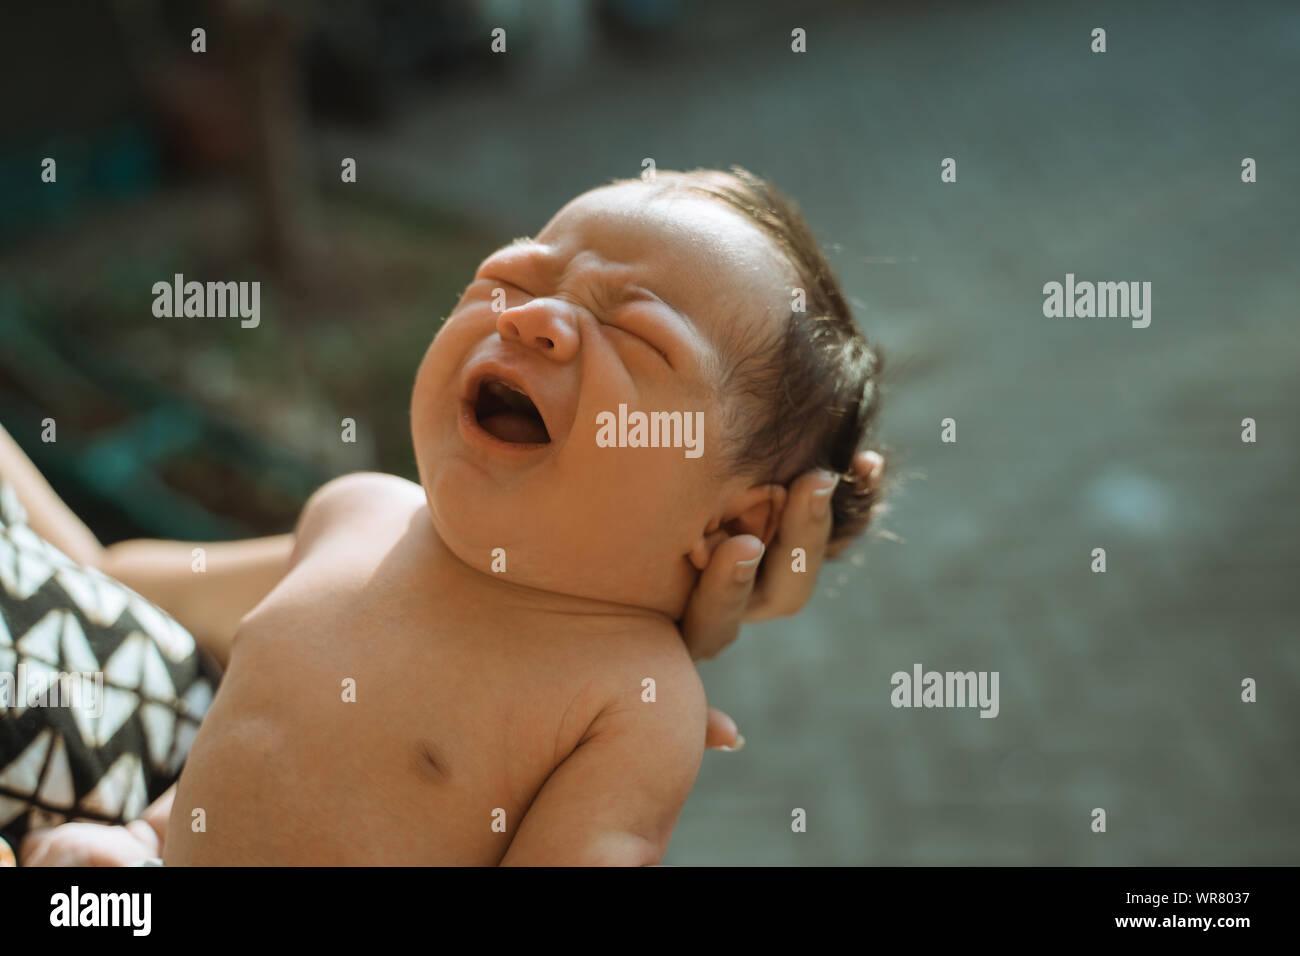 Cropped image of newborn sunbathing baby Stock Photo